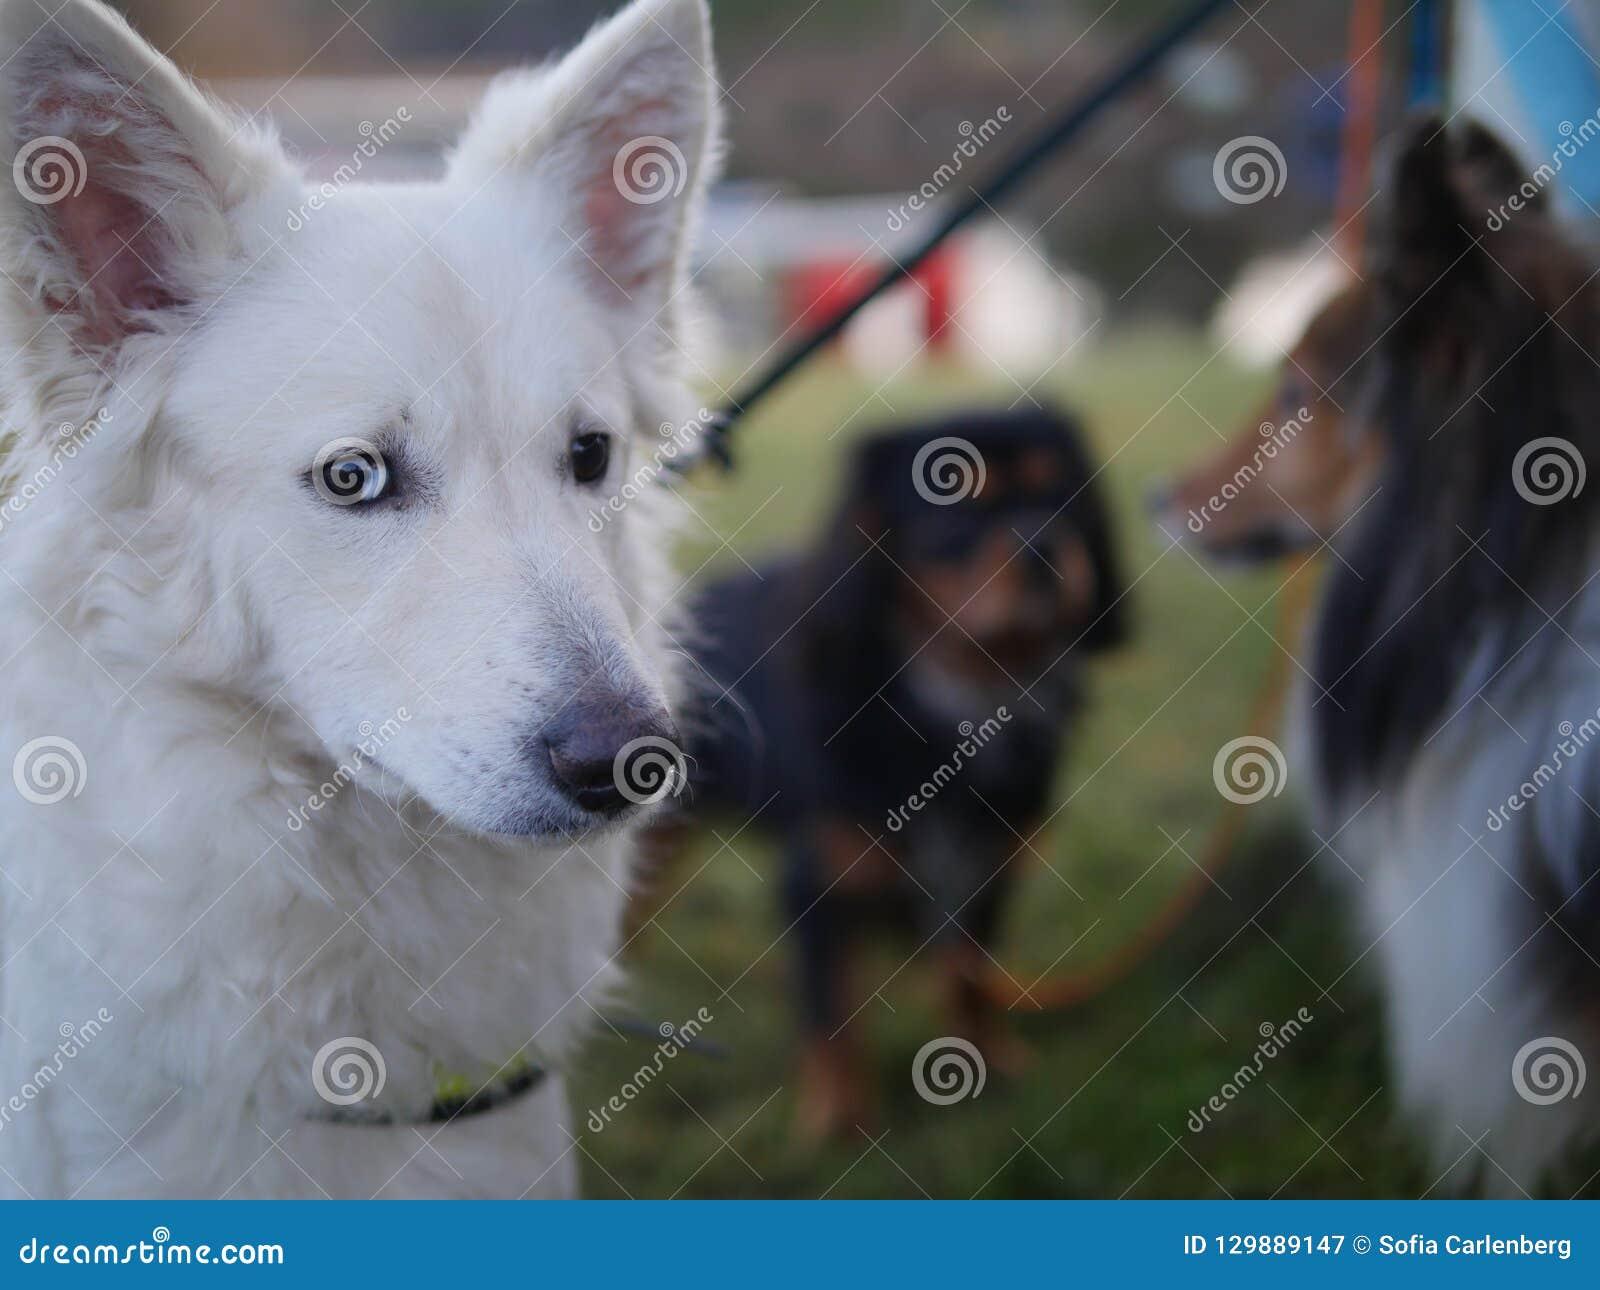 Mudi, Shetland sheepdog and Cavalier king charles spaniel